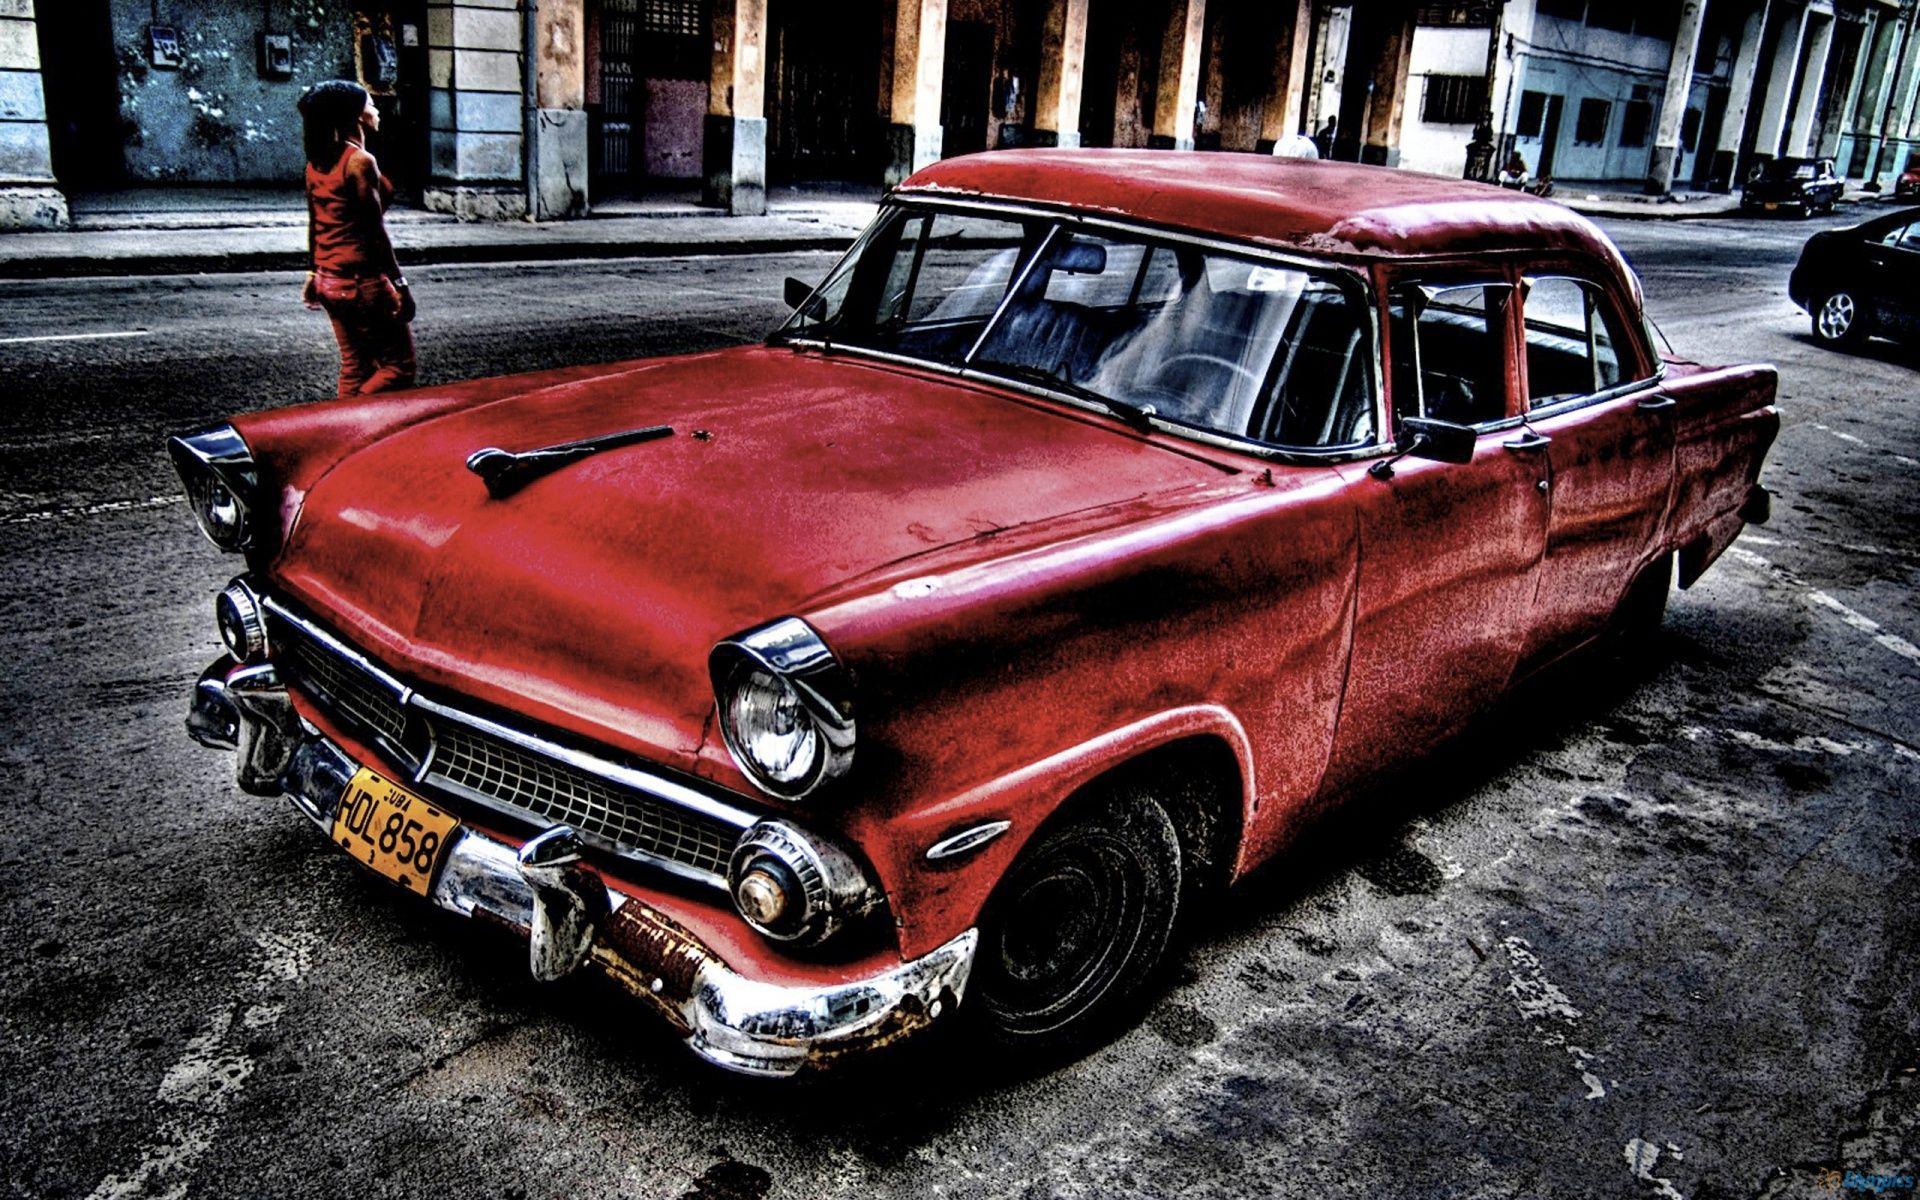 Pin by Mustafa Duran on Classic Car | Pinterest | Cars